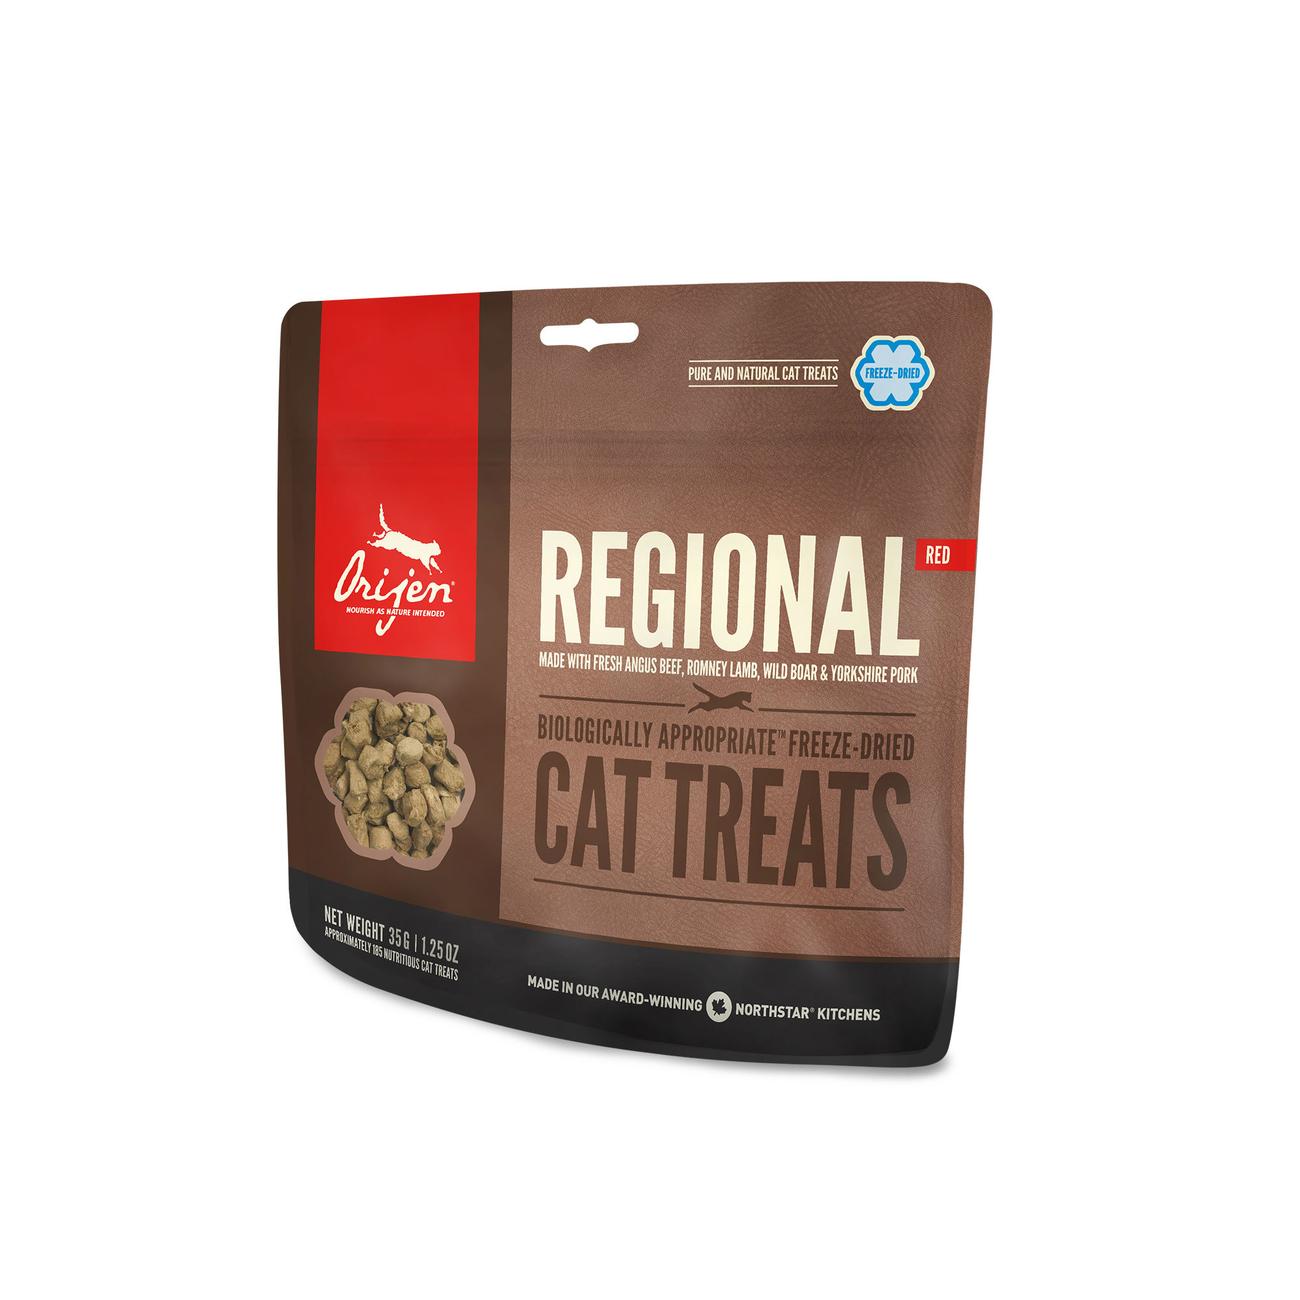 Orijen gefriergetrocknete Katzen Leckerli, Regional Cat 35g